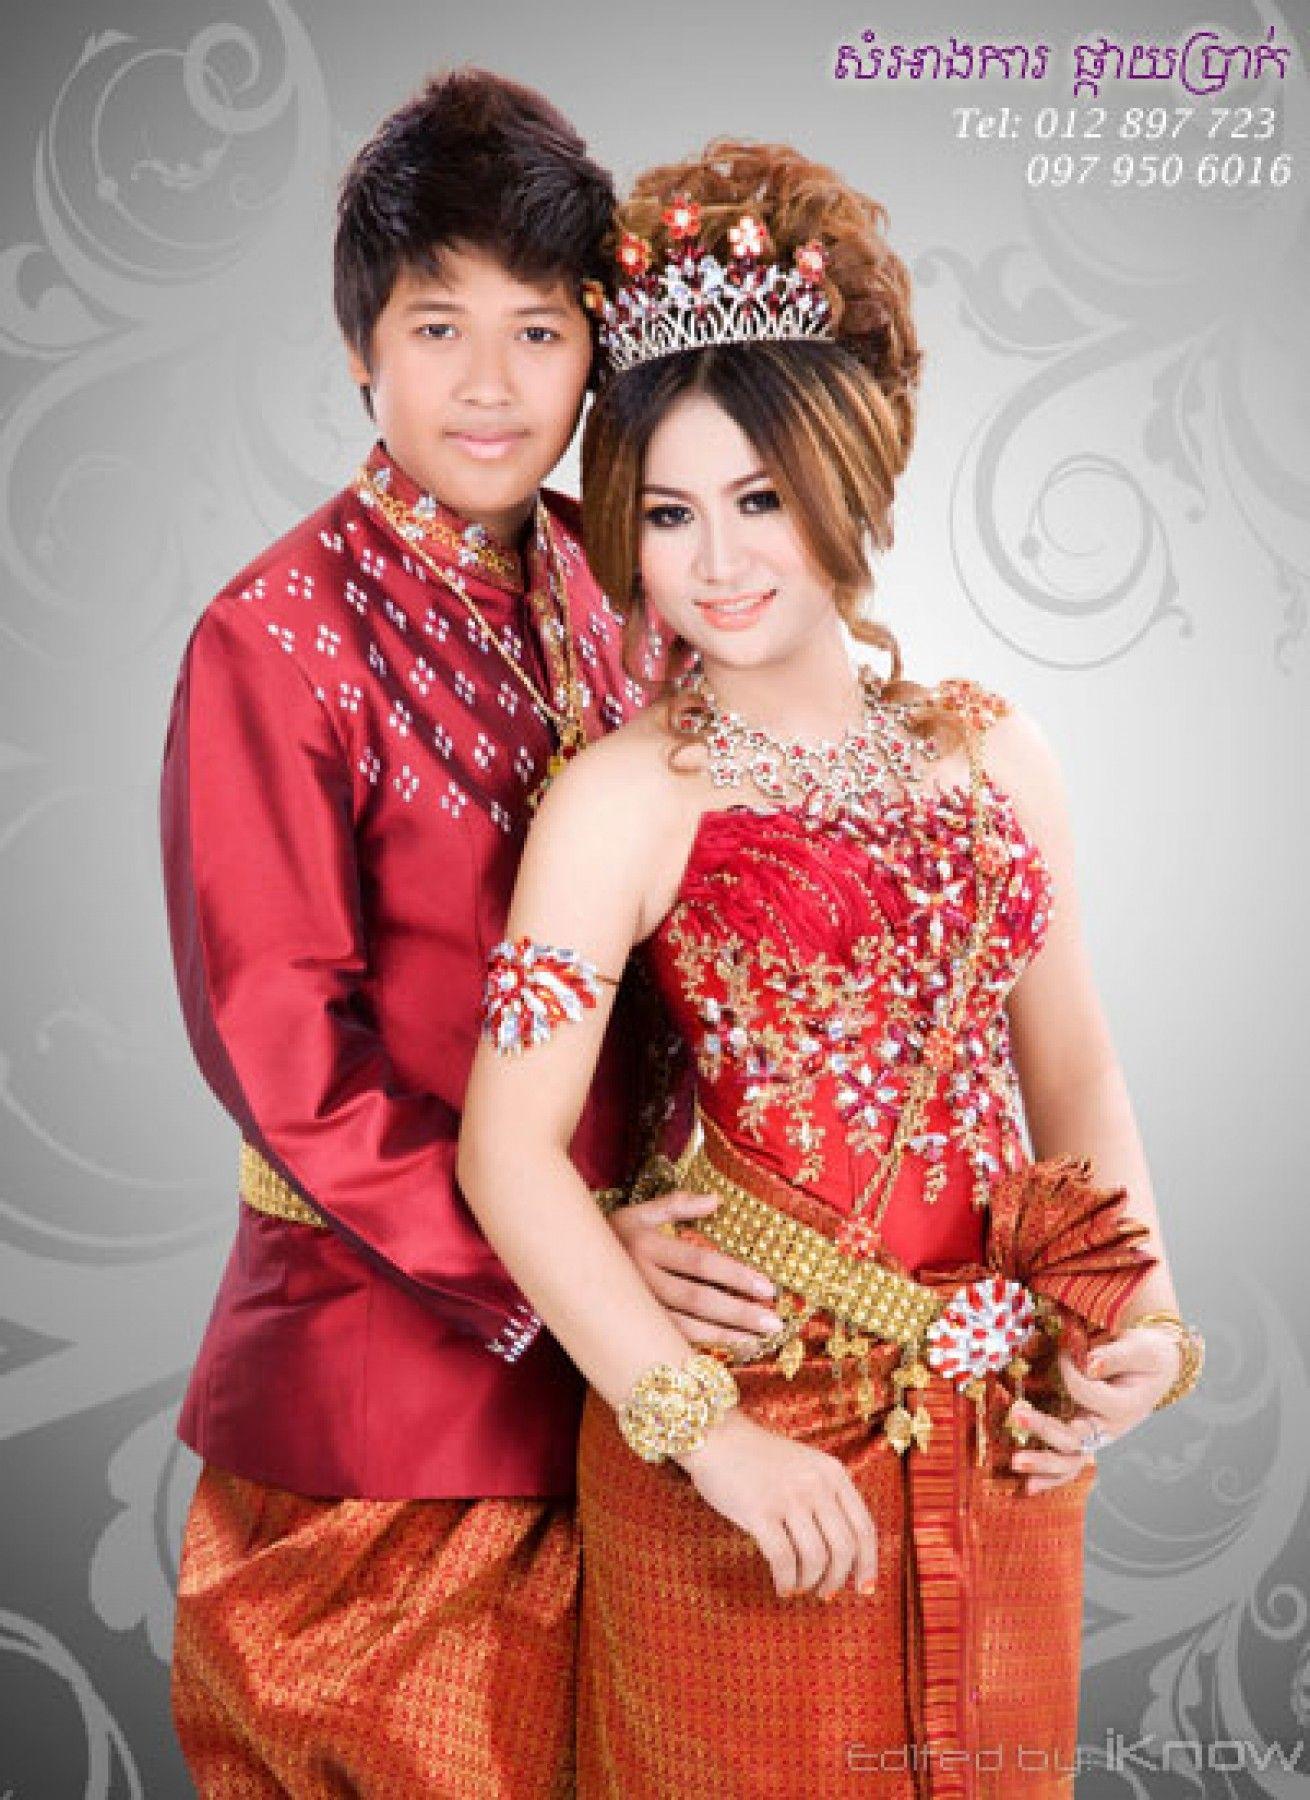 Cambodian Wedding Costume